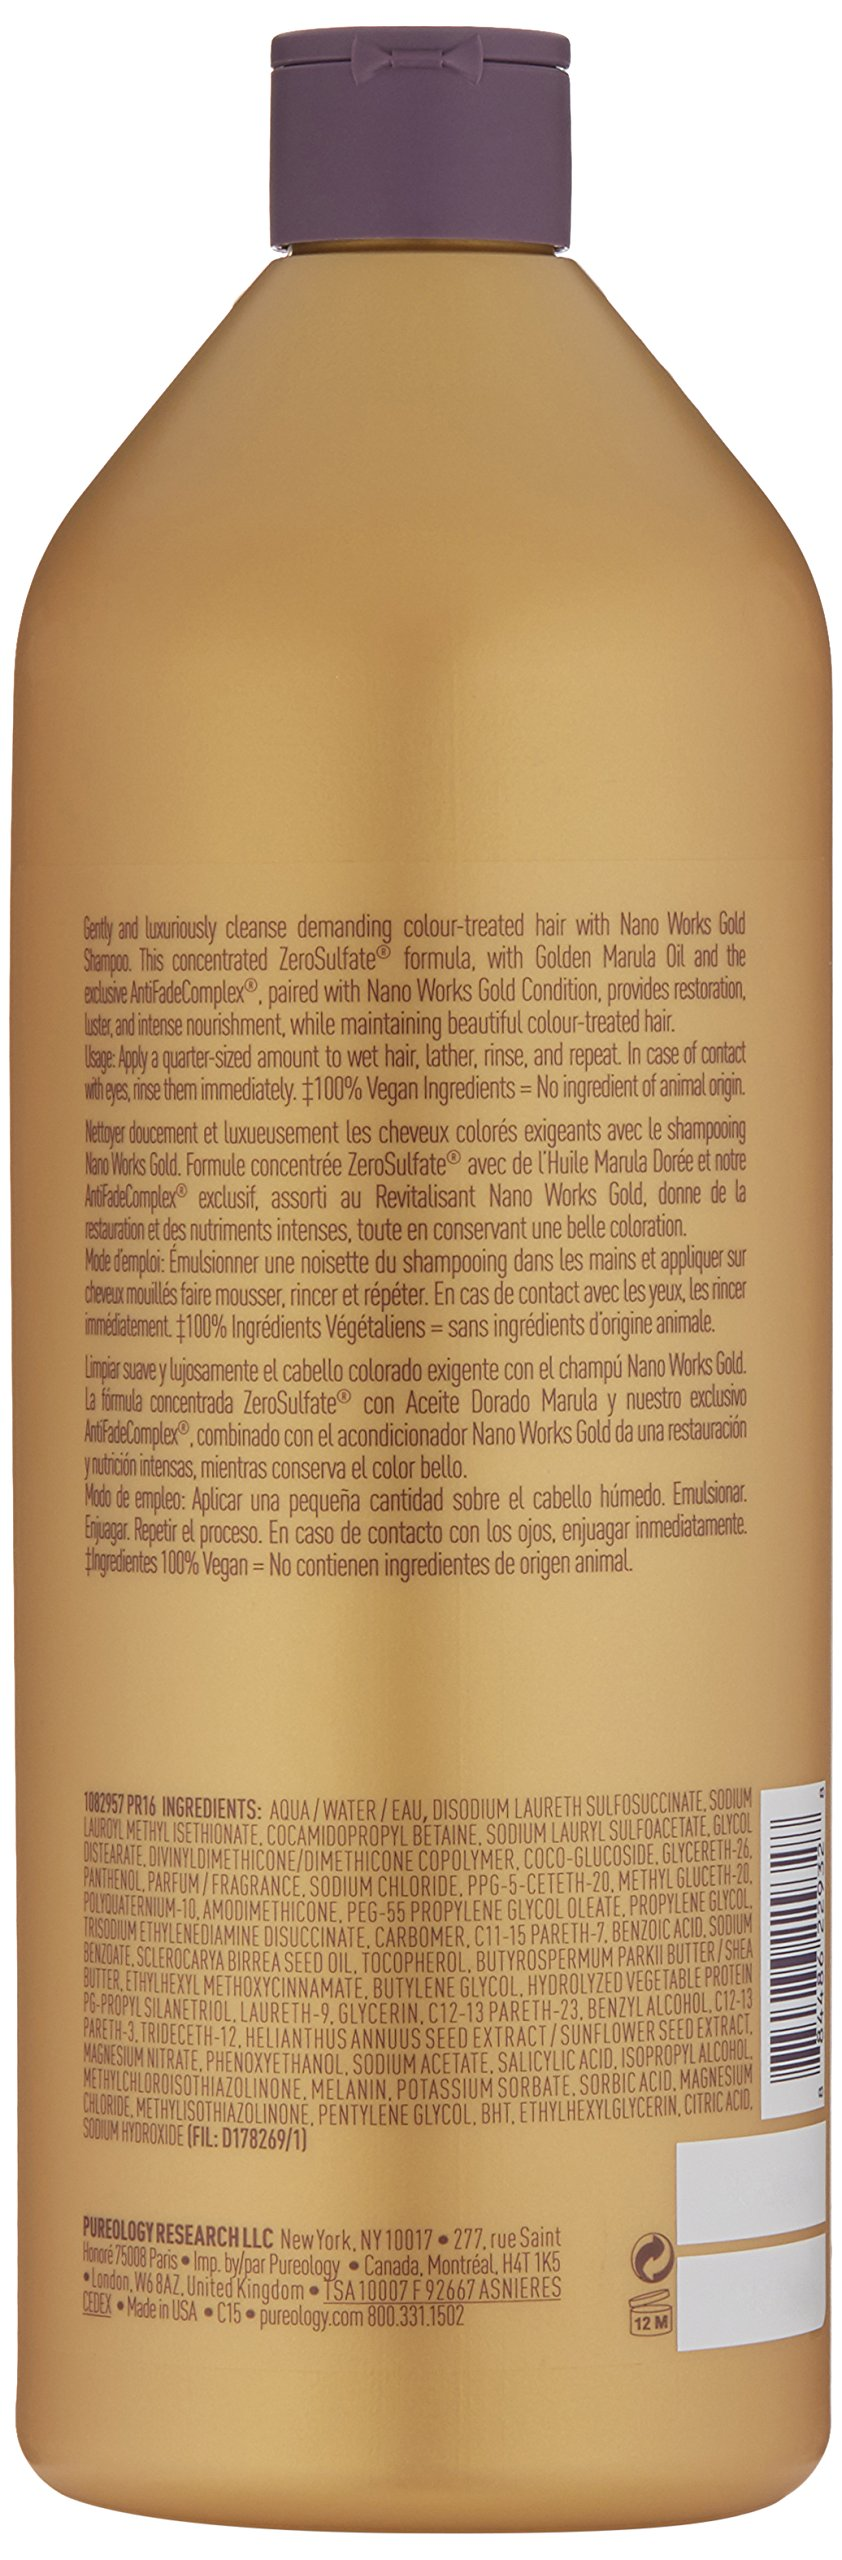 Pureology Nano Works Gold Shampoo ,33.8 Fl Oz by Pureology (Image #2)